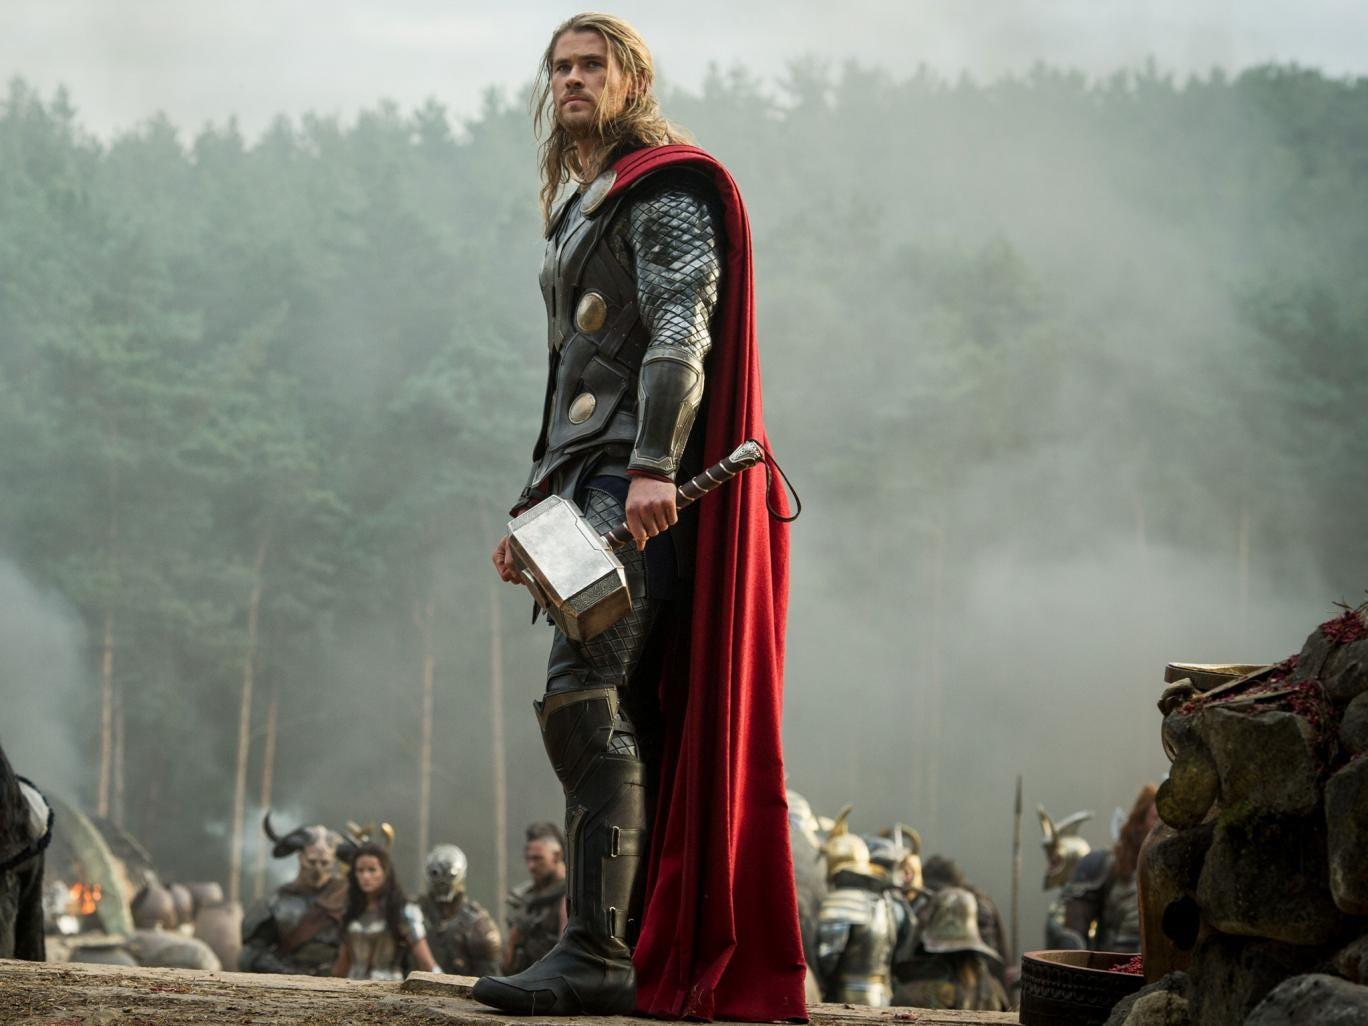 Chris Hemsworth stars in Thor: The Dark World